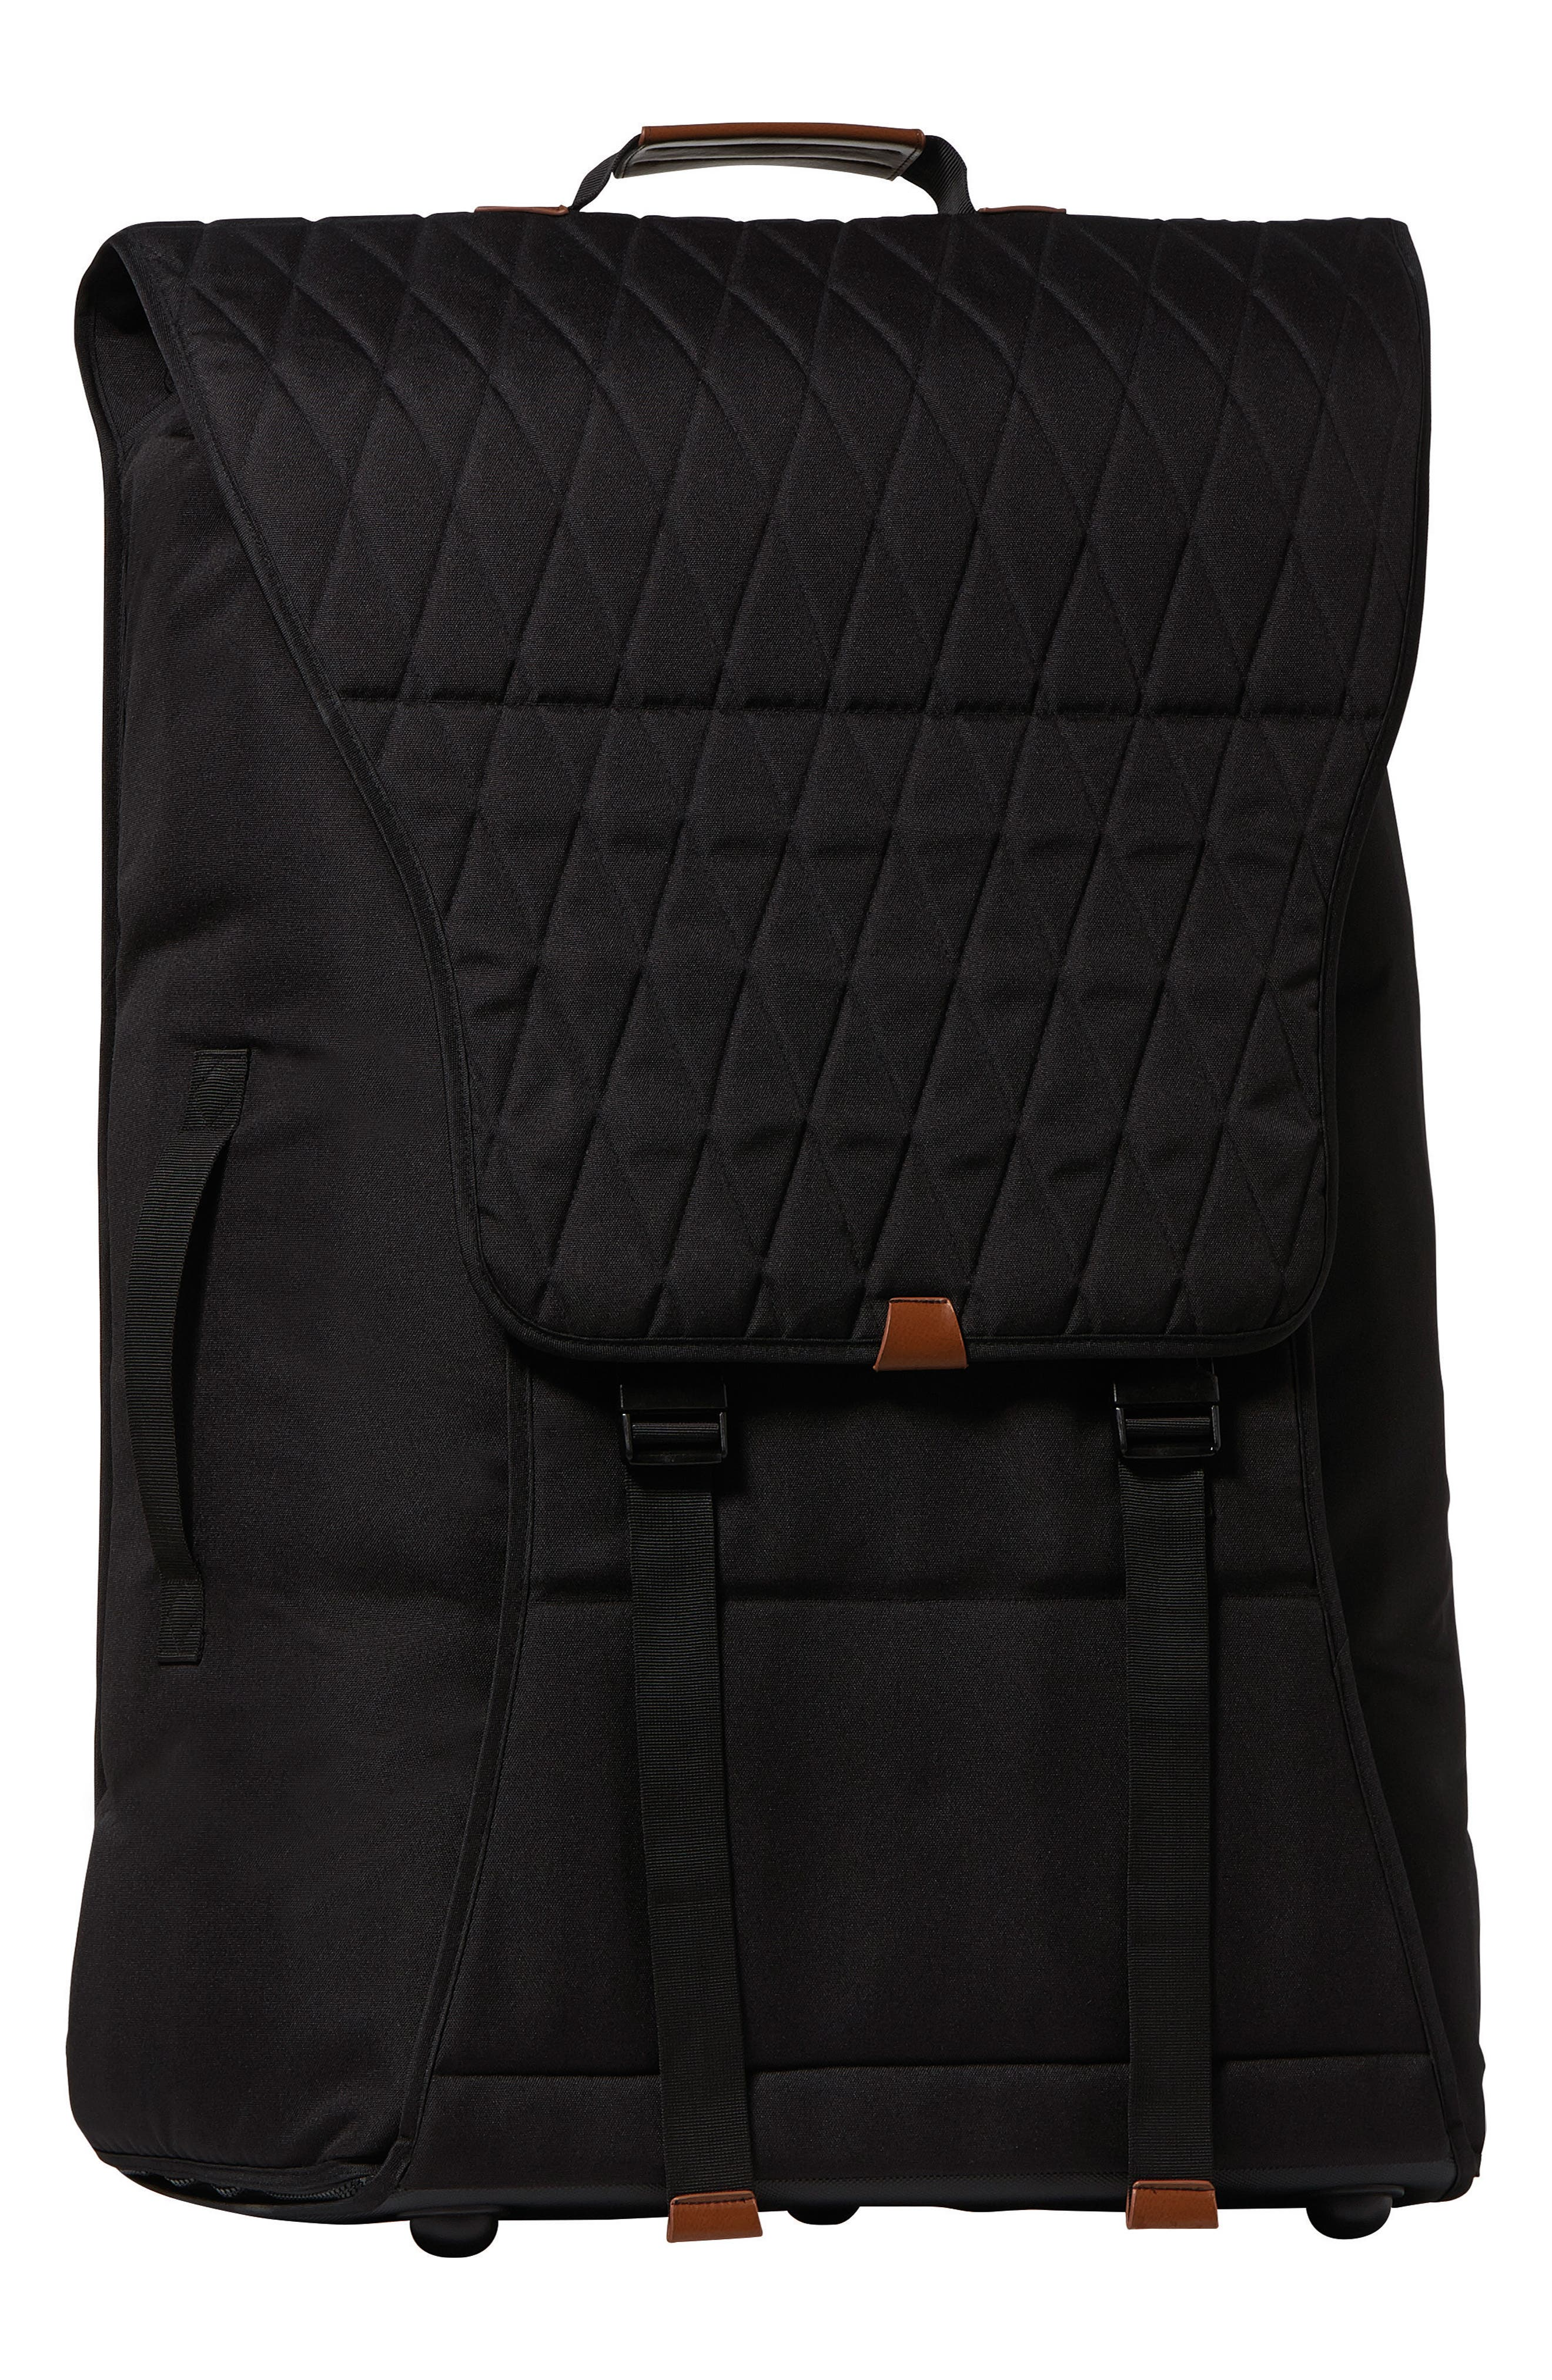 Traveller Water-Resistant Stroller Travel Bag,                             Main thumbnail 1, color,                             BLACK